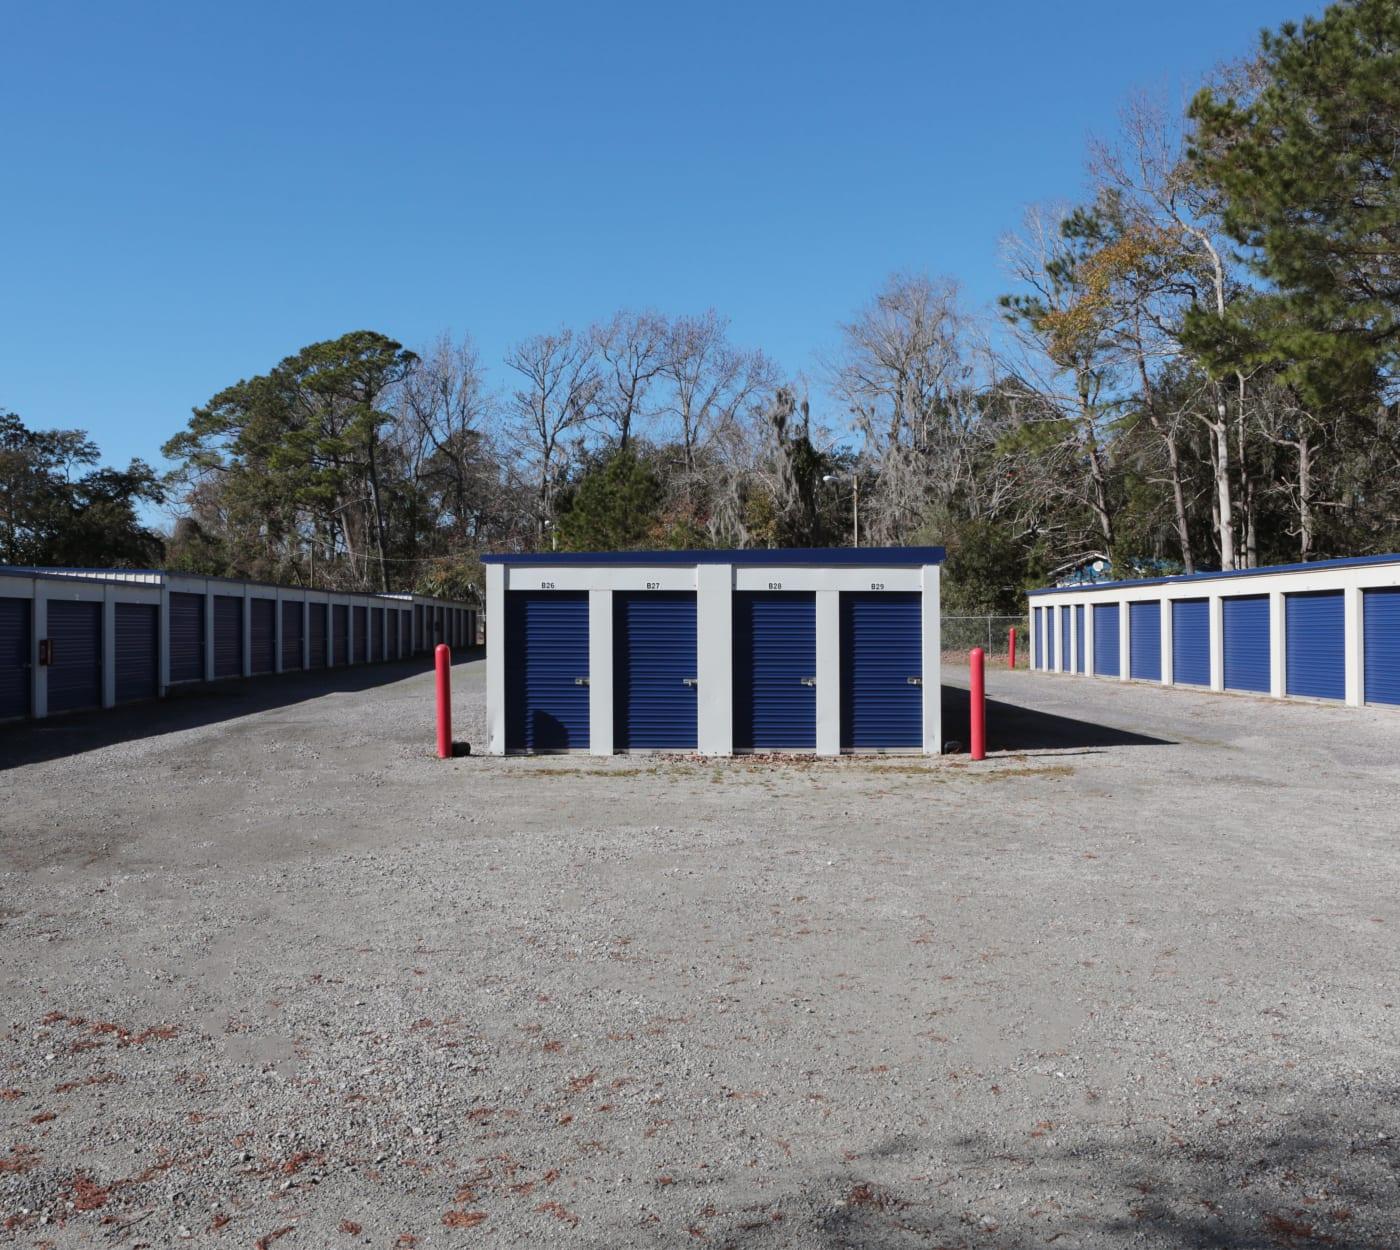 External units at Midgard Self Storage in Murrells Inlet, South Carolina